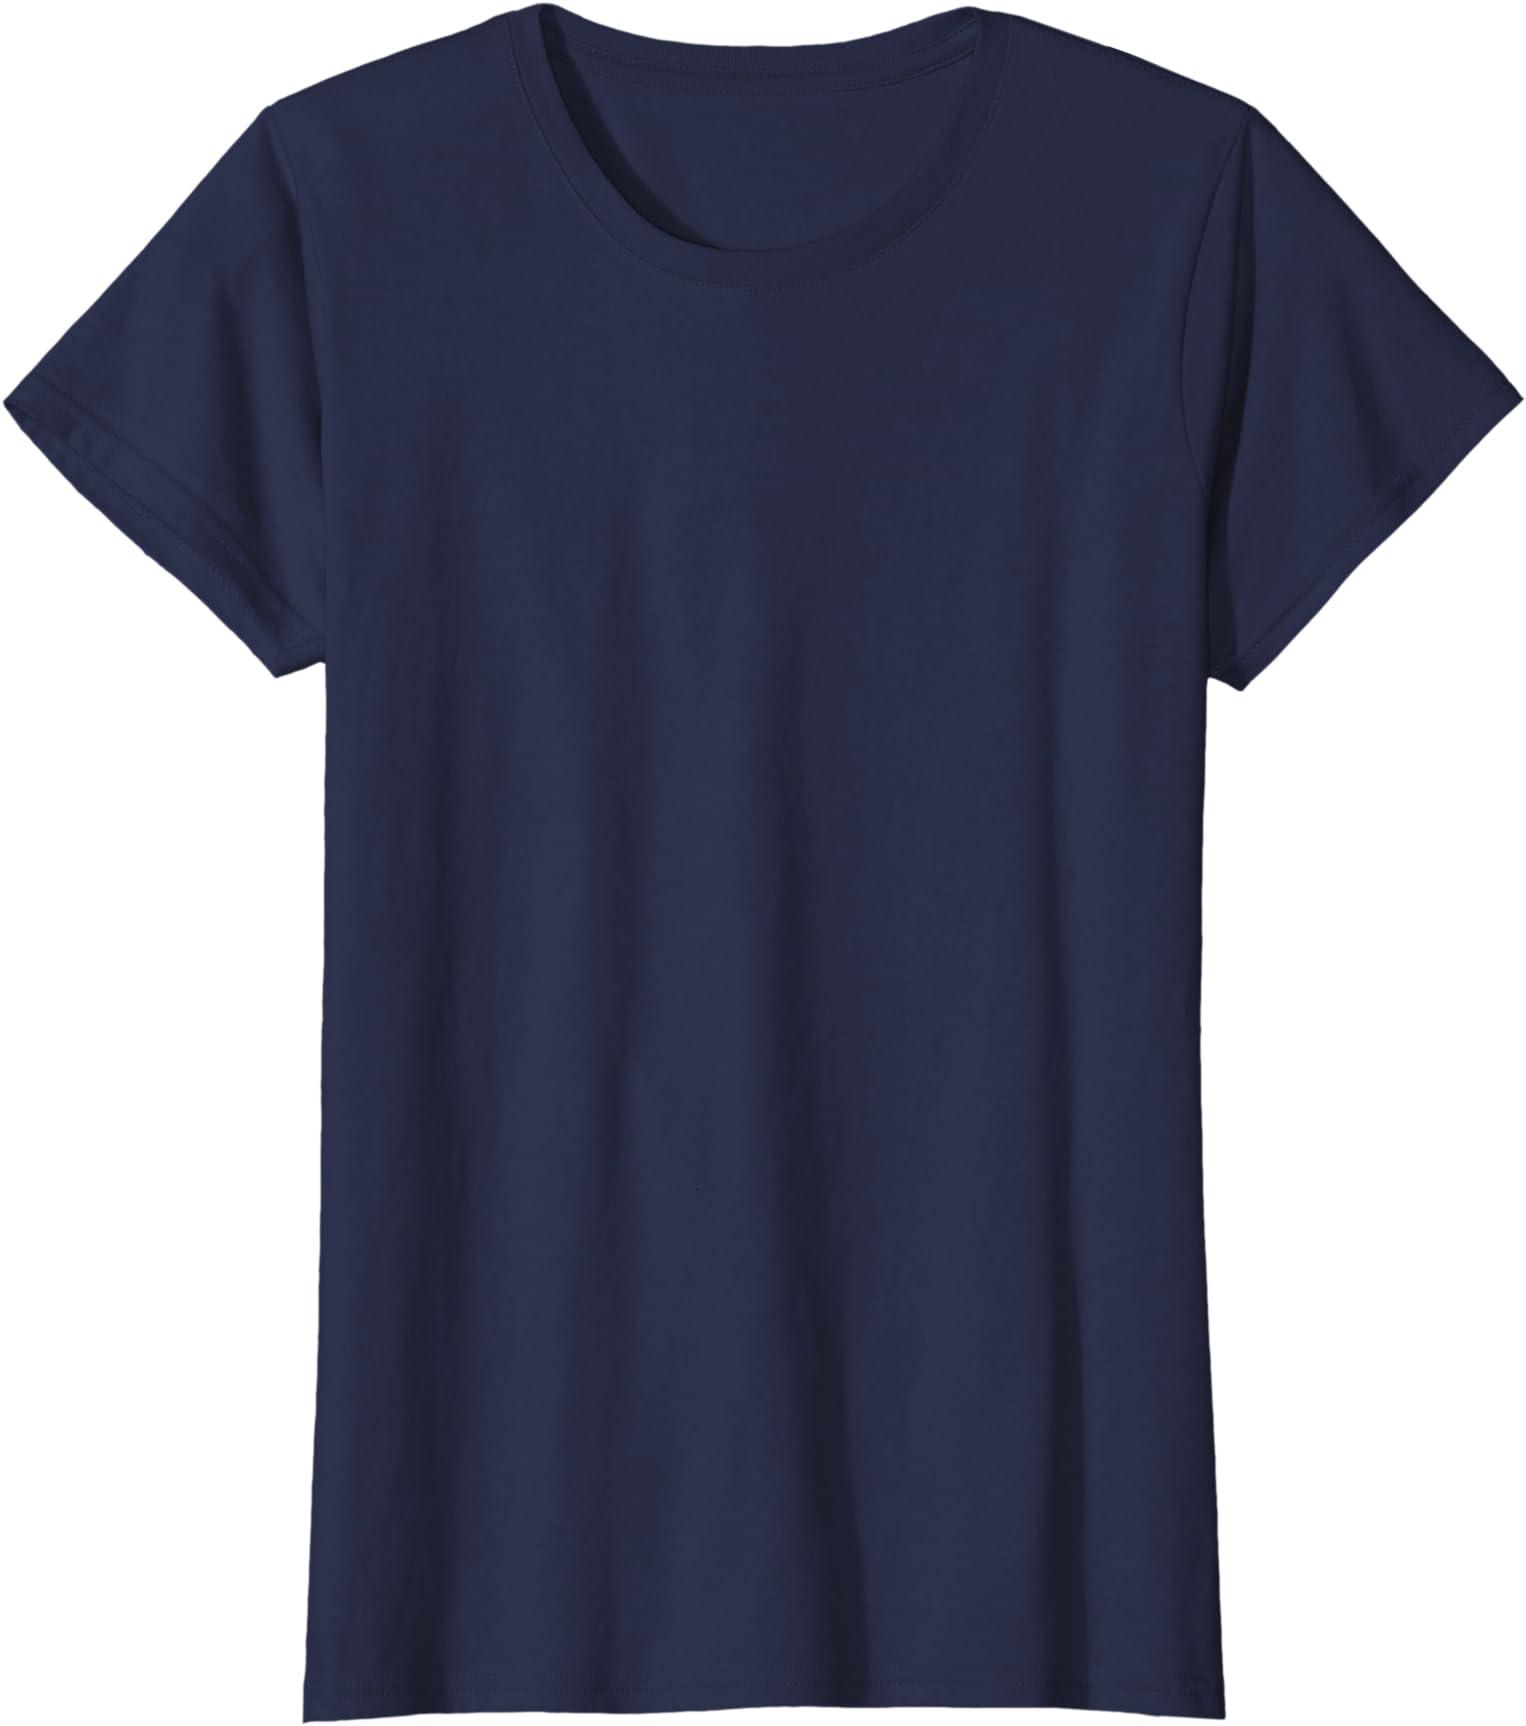 Scottish Heritage Clothing Scotland Cotton Tee Mitchell Clan T-Shirt